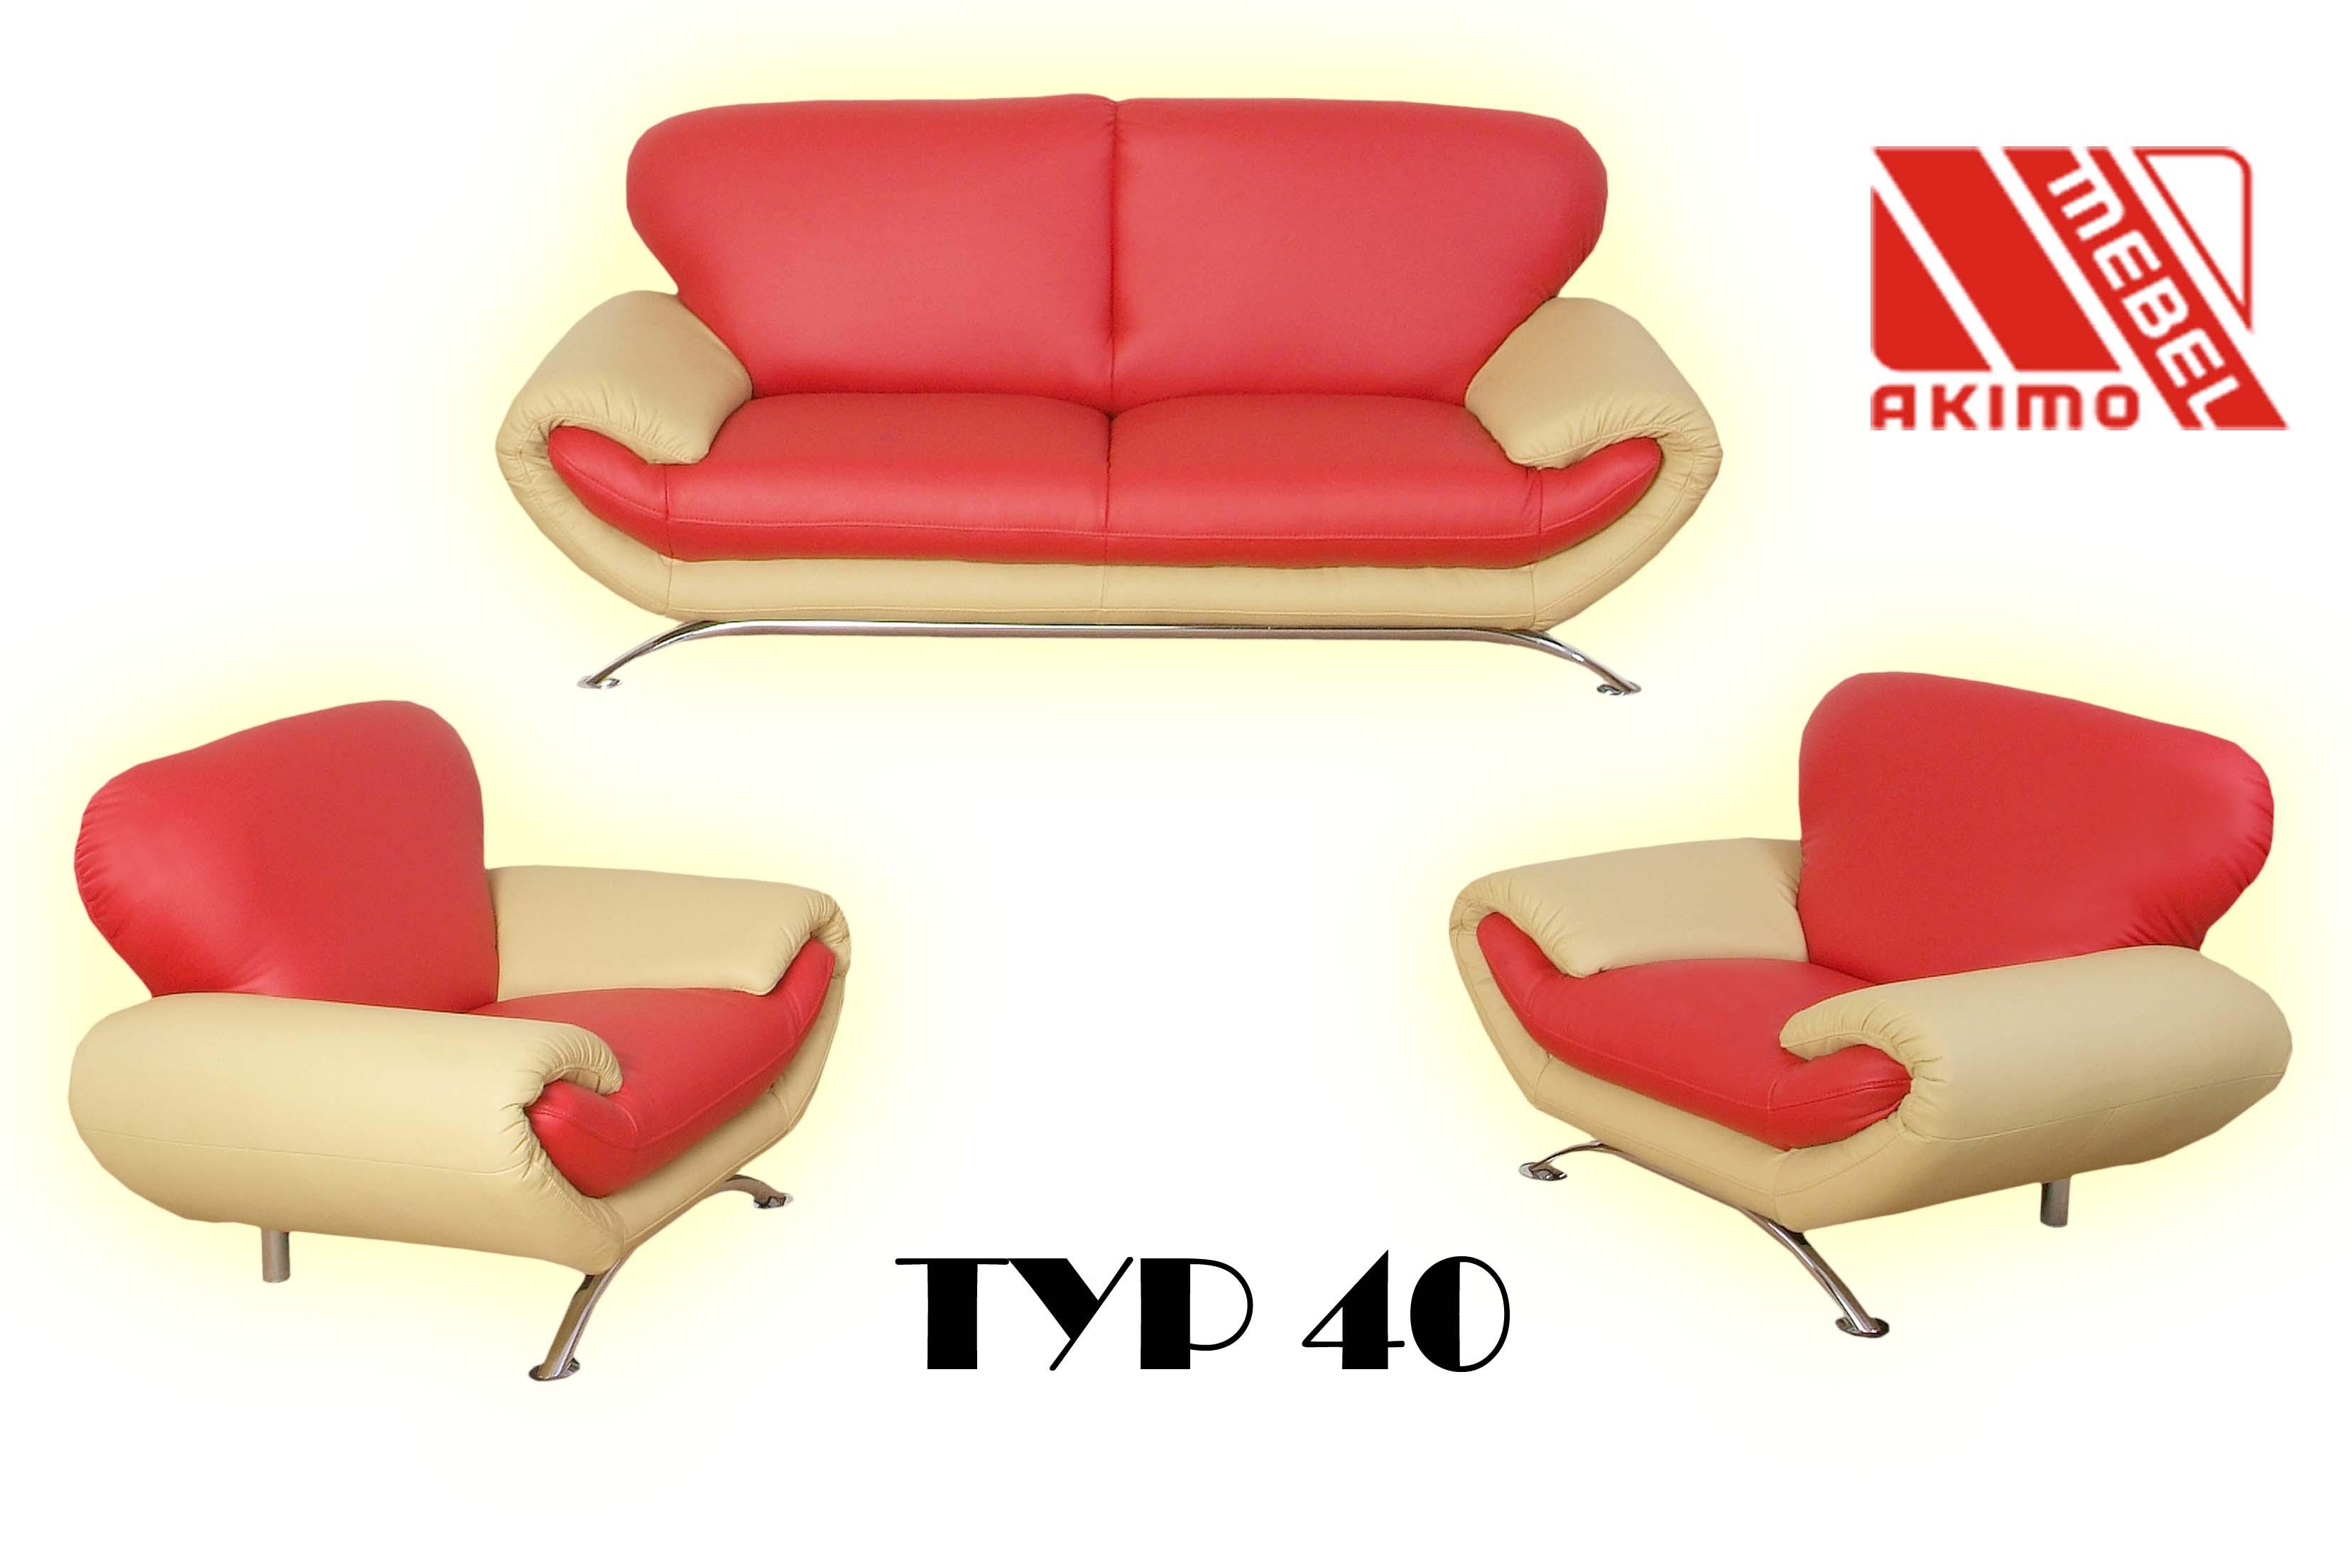 Typ 40